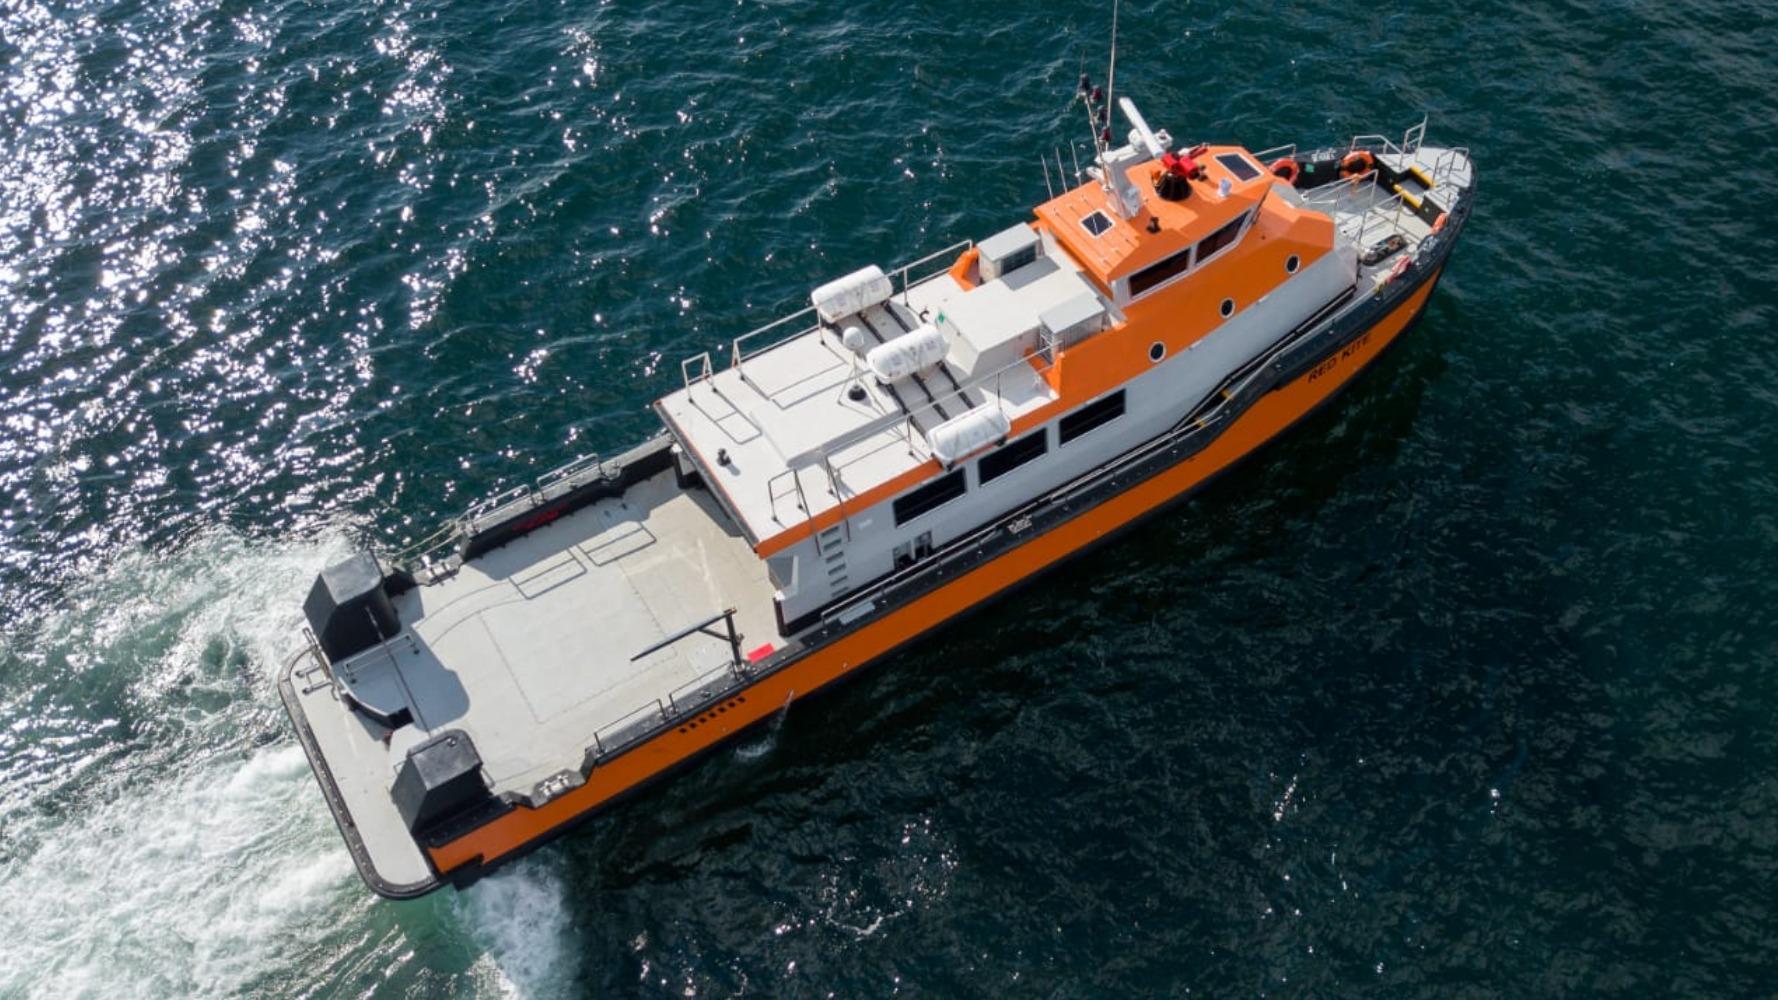 Class A Crew Boat